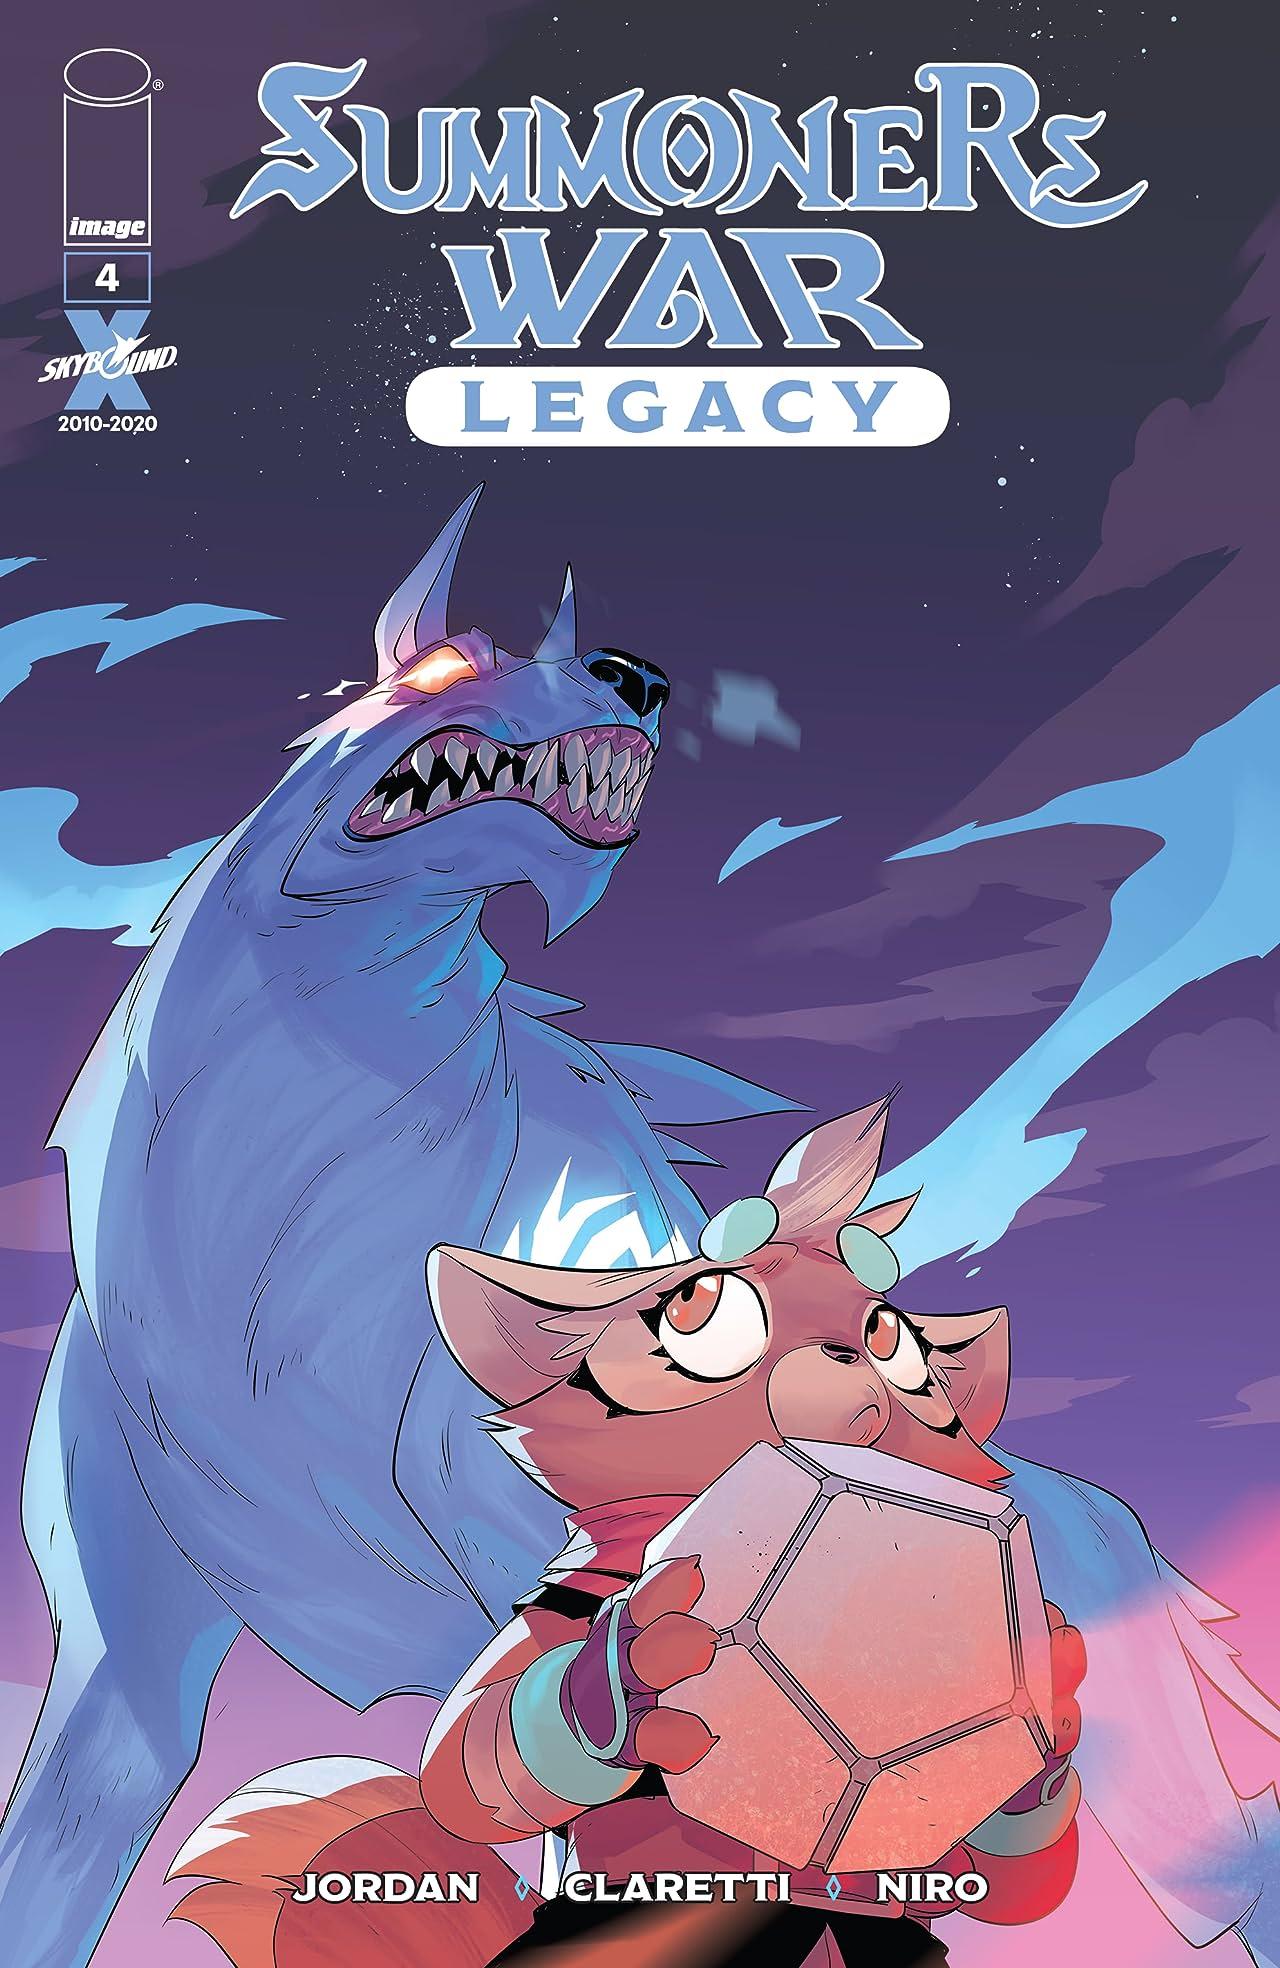 Summoner's War: Legacy #4